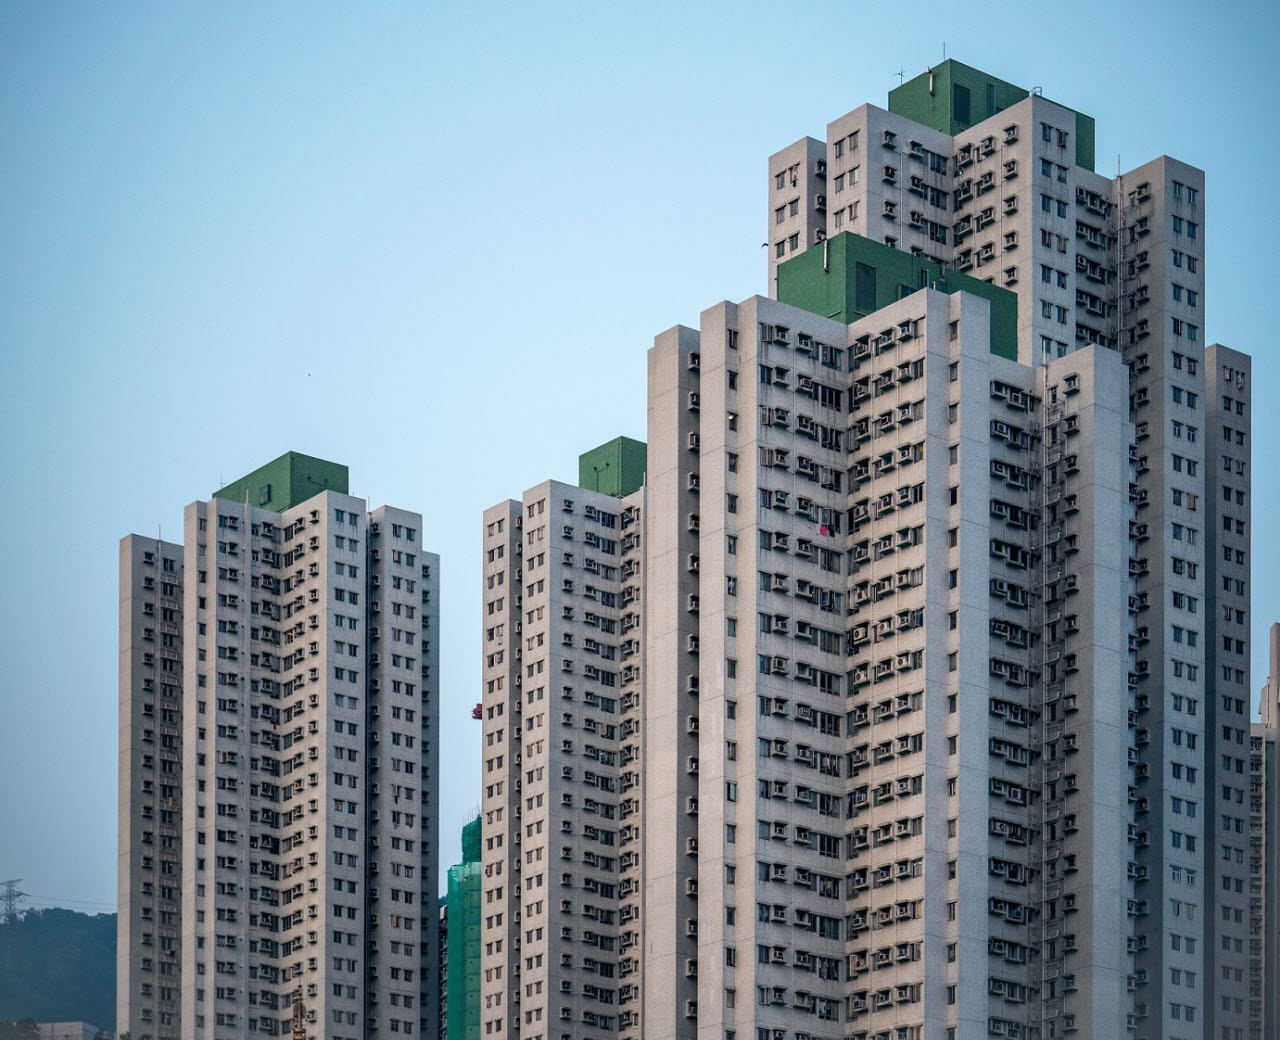 Hong Kong high rise residential buildings